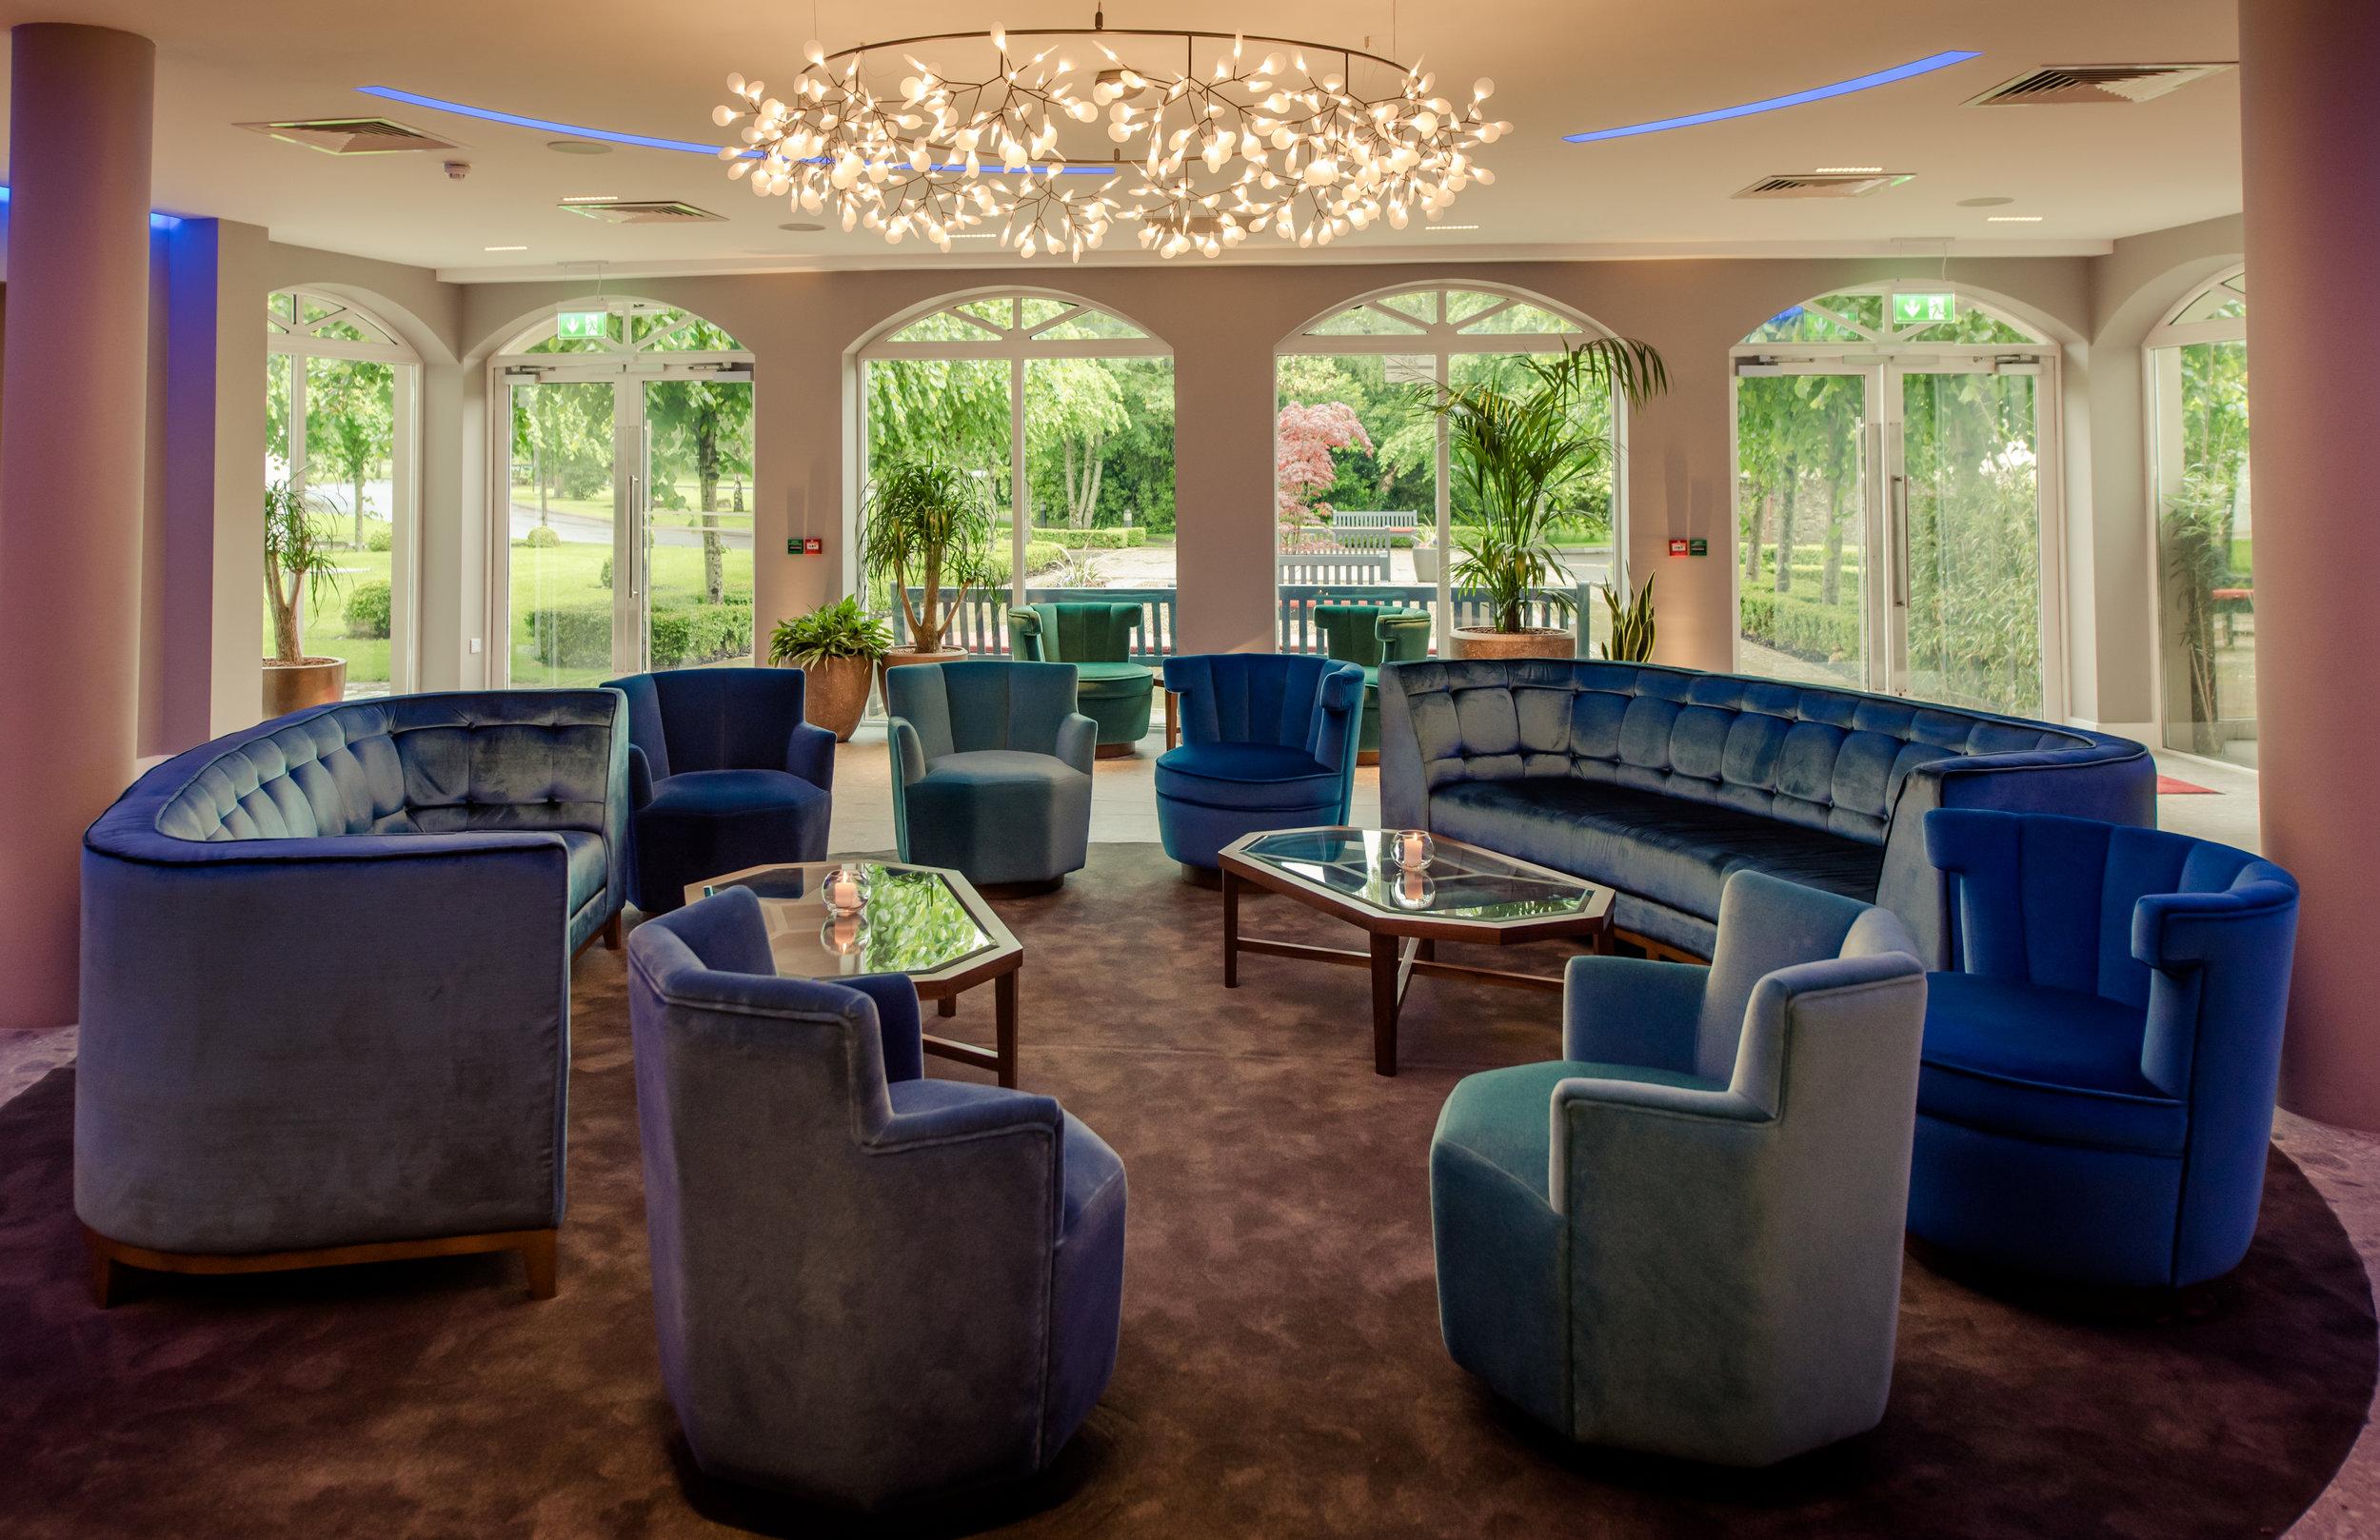 Tulfarris Hotel & Golf Resort lobby seating and view.jpg